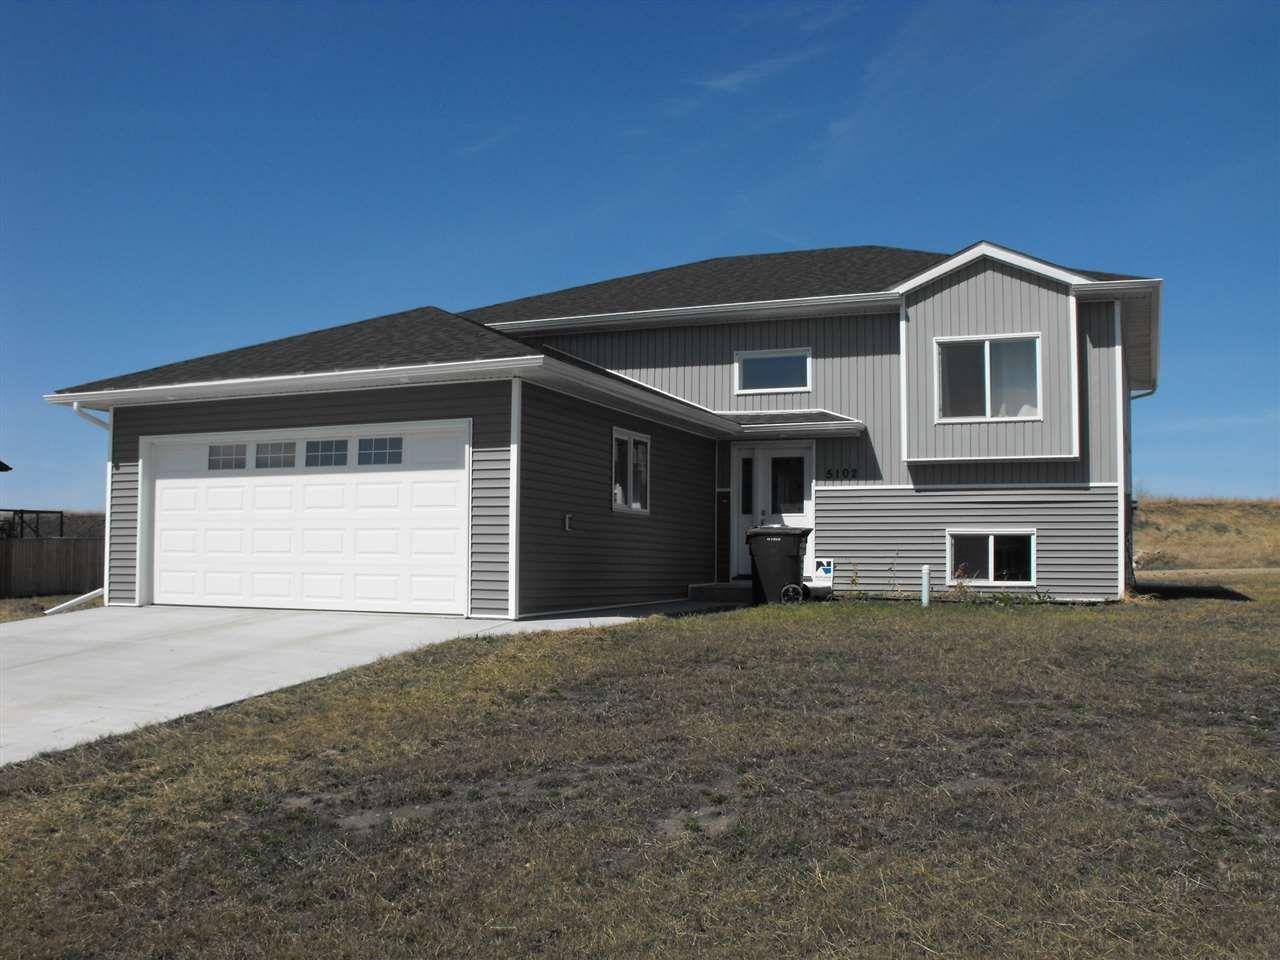 Main Photo: 5102 60 Avenue: Elk Point House for sale : MLS®# E4197855